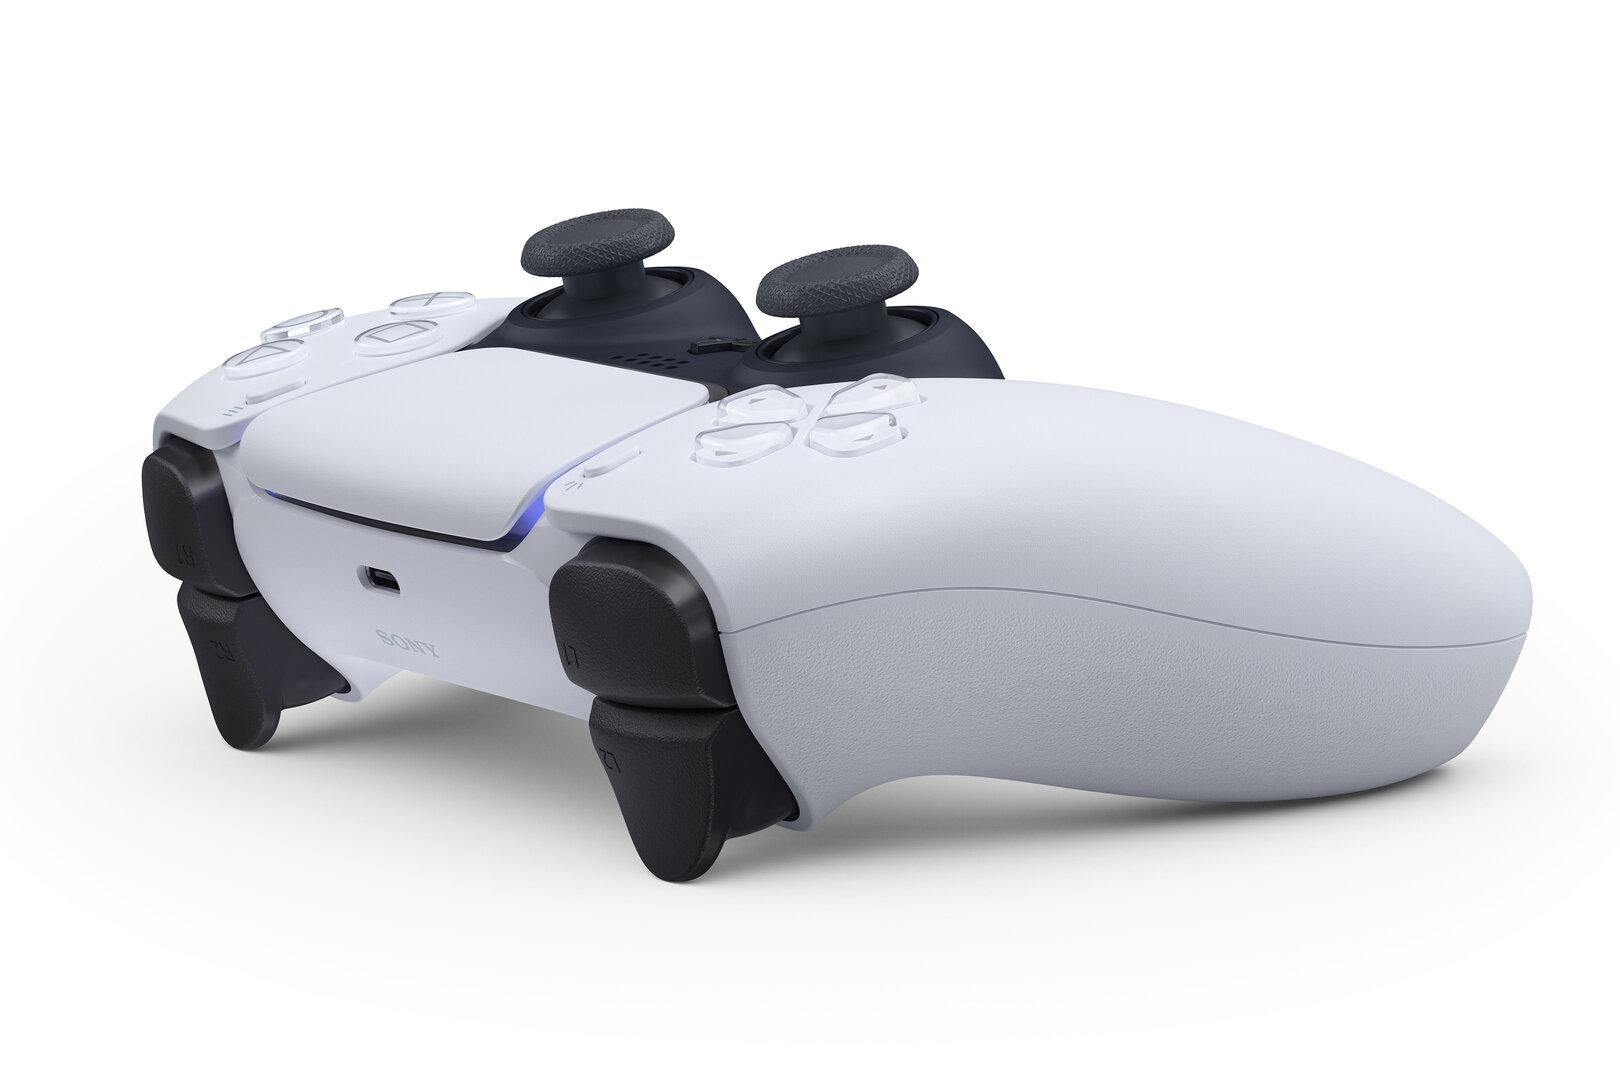 Adaptive Trigger des DualSense Controllers